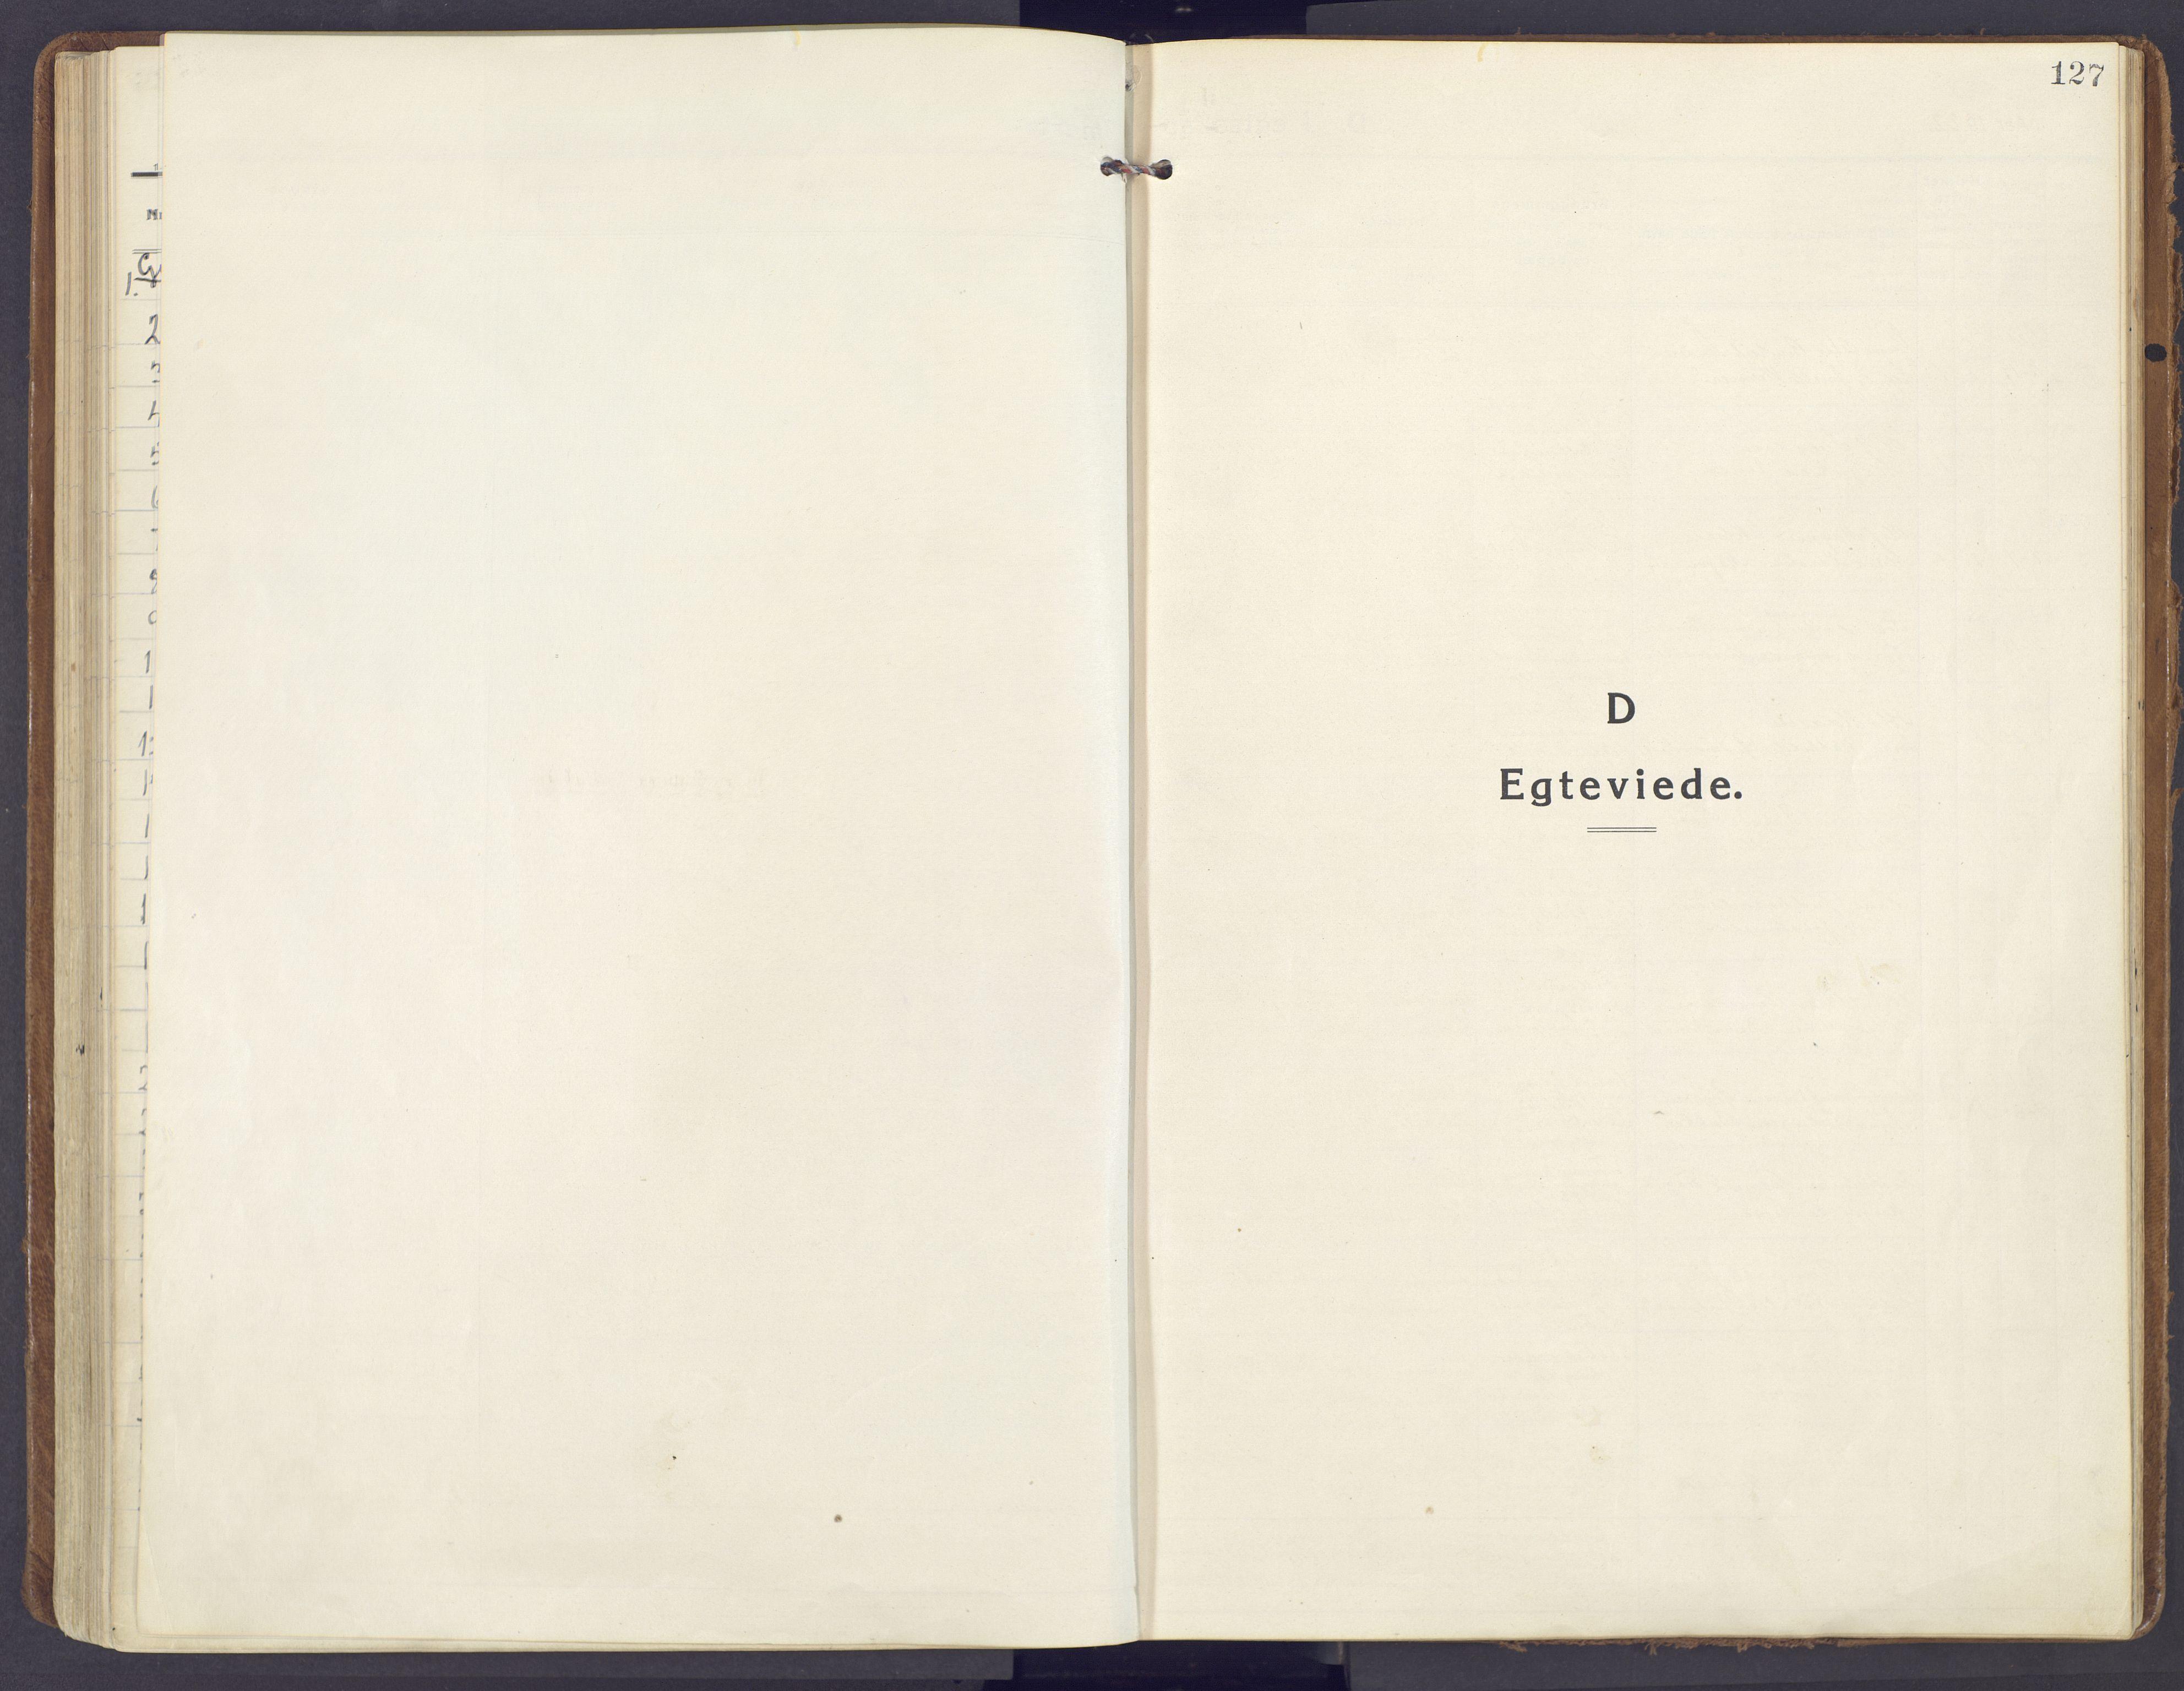 SAH, Lunner prestekontor, H/Ha/Haa/L0002: Ministerialbok nr. 2, 1922-1931, s. 127